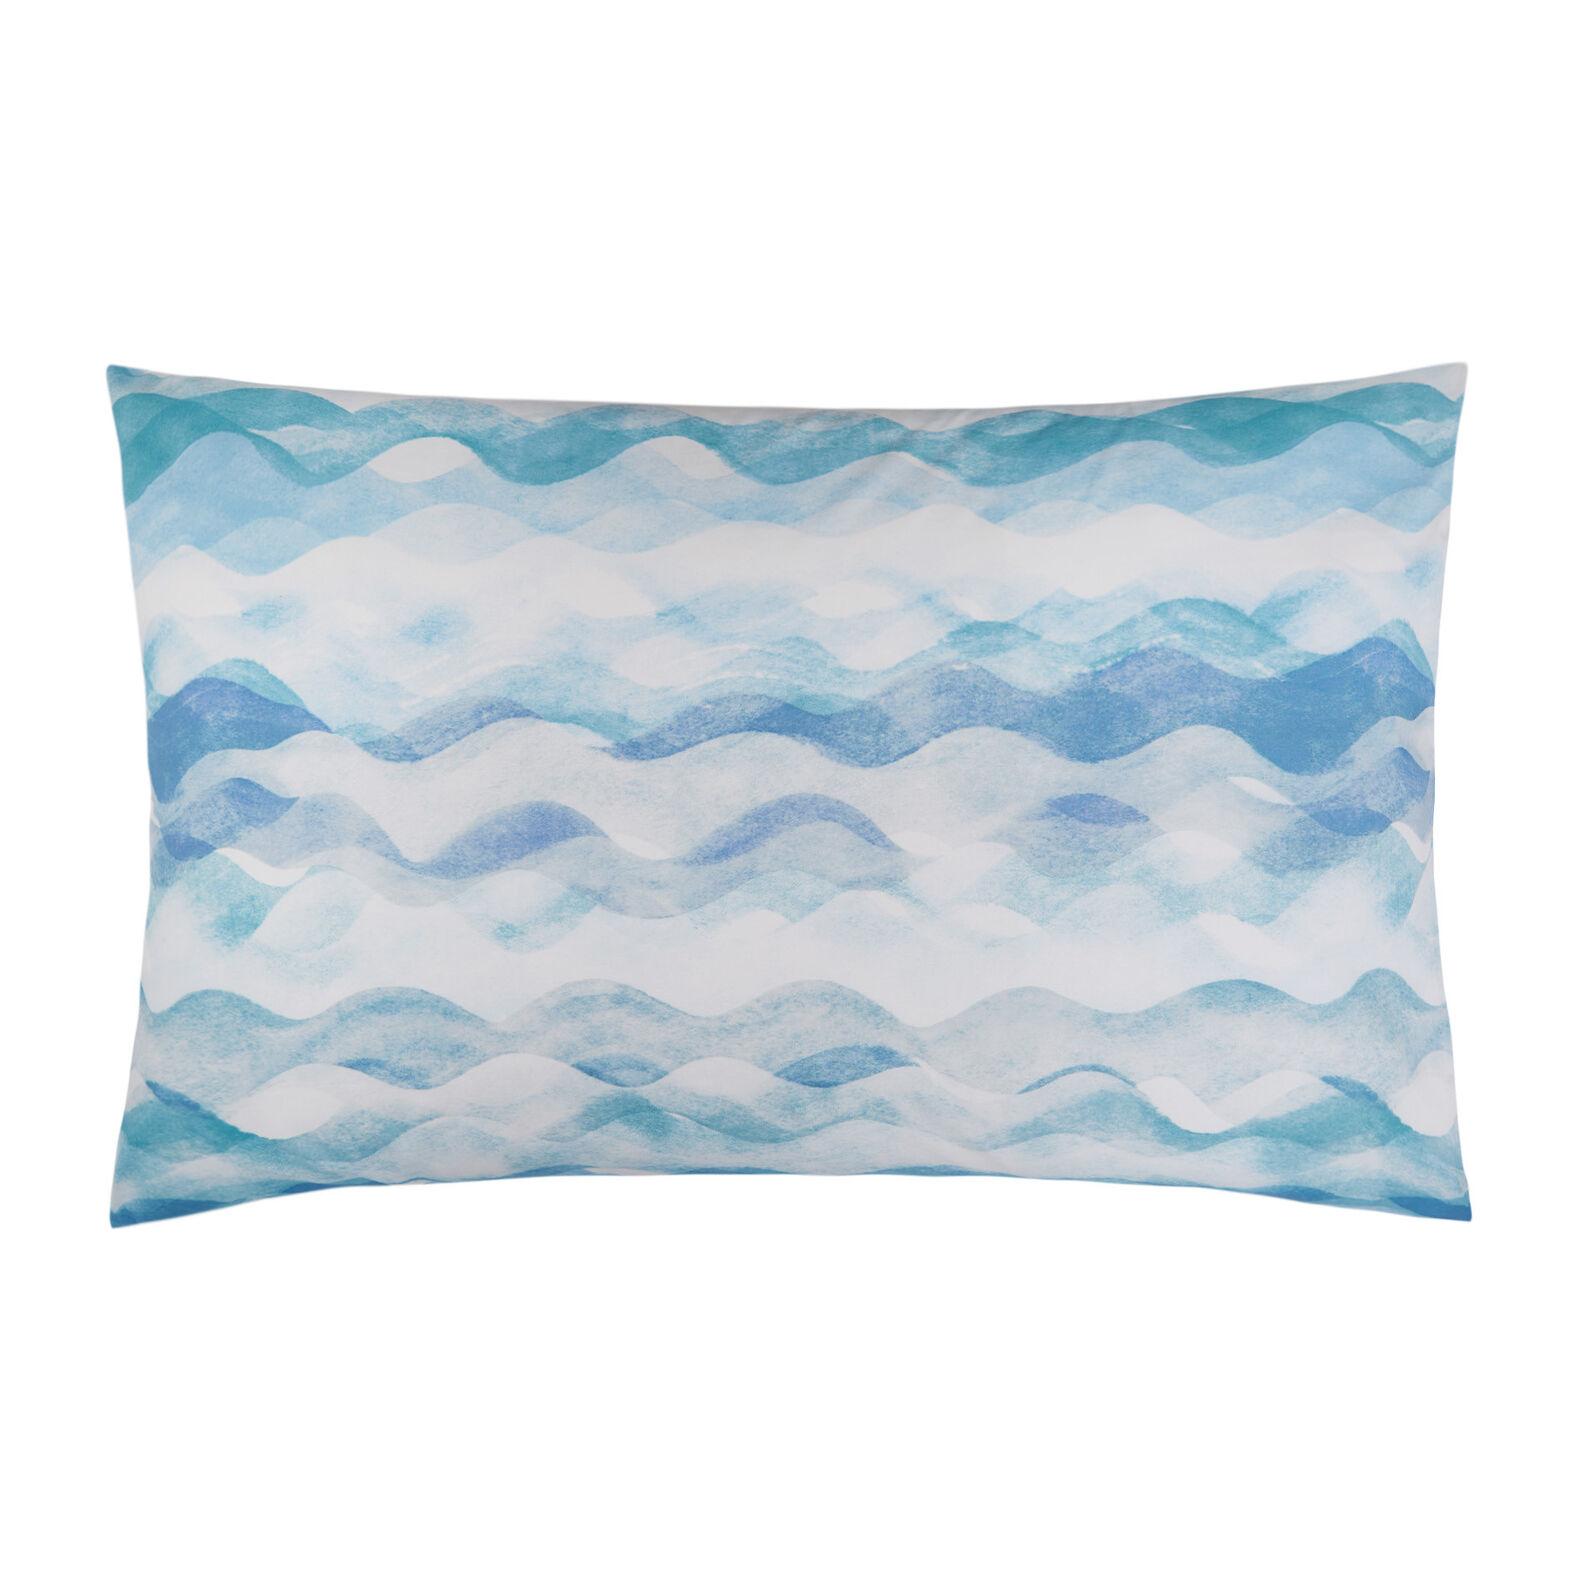 Organic cotton pillowcase with wave pattern